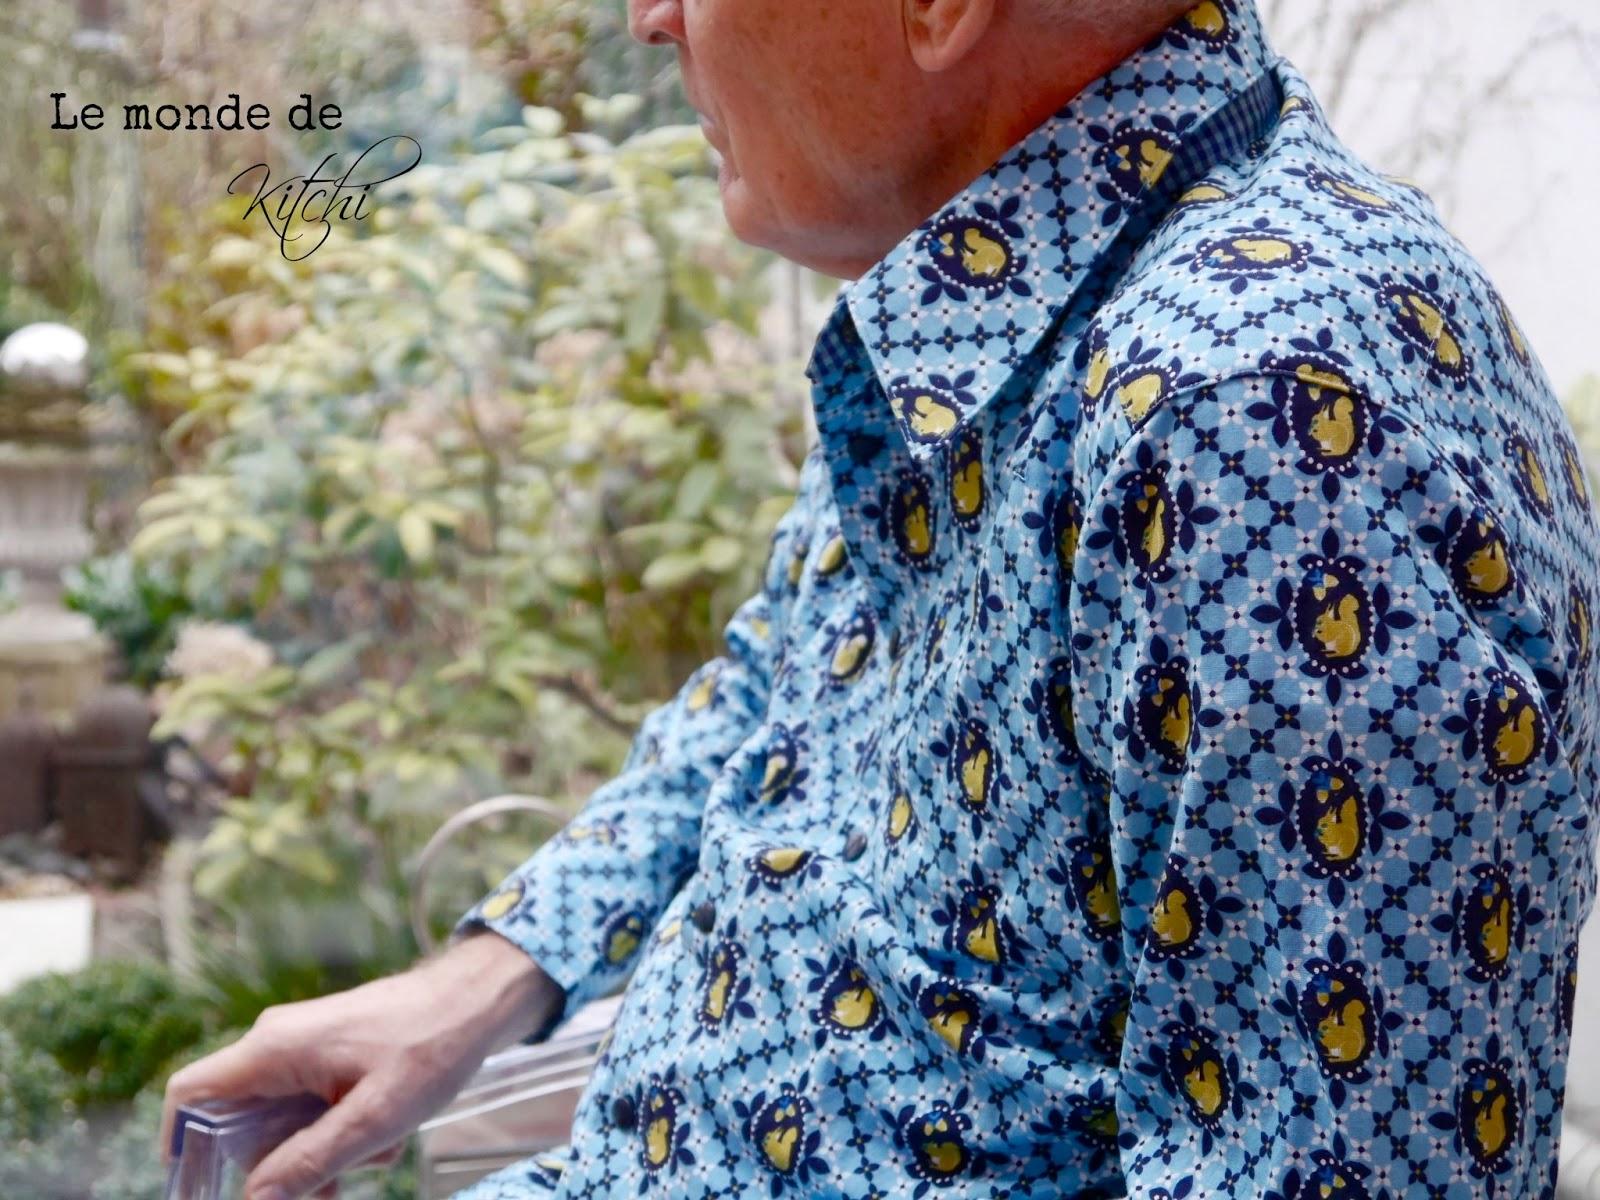 Le monde de Kitchi: Hemden nähen ist nicht schwer II